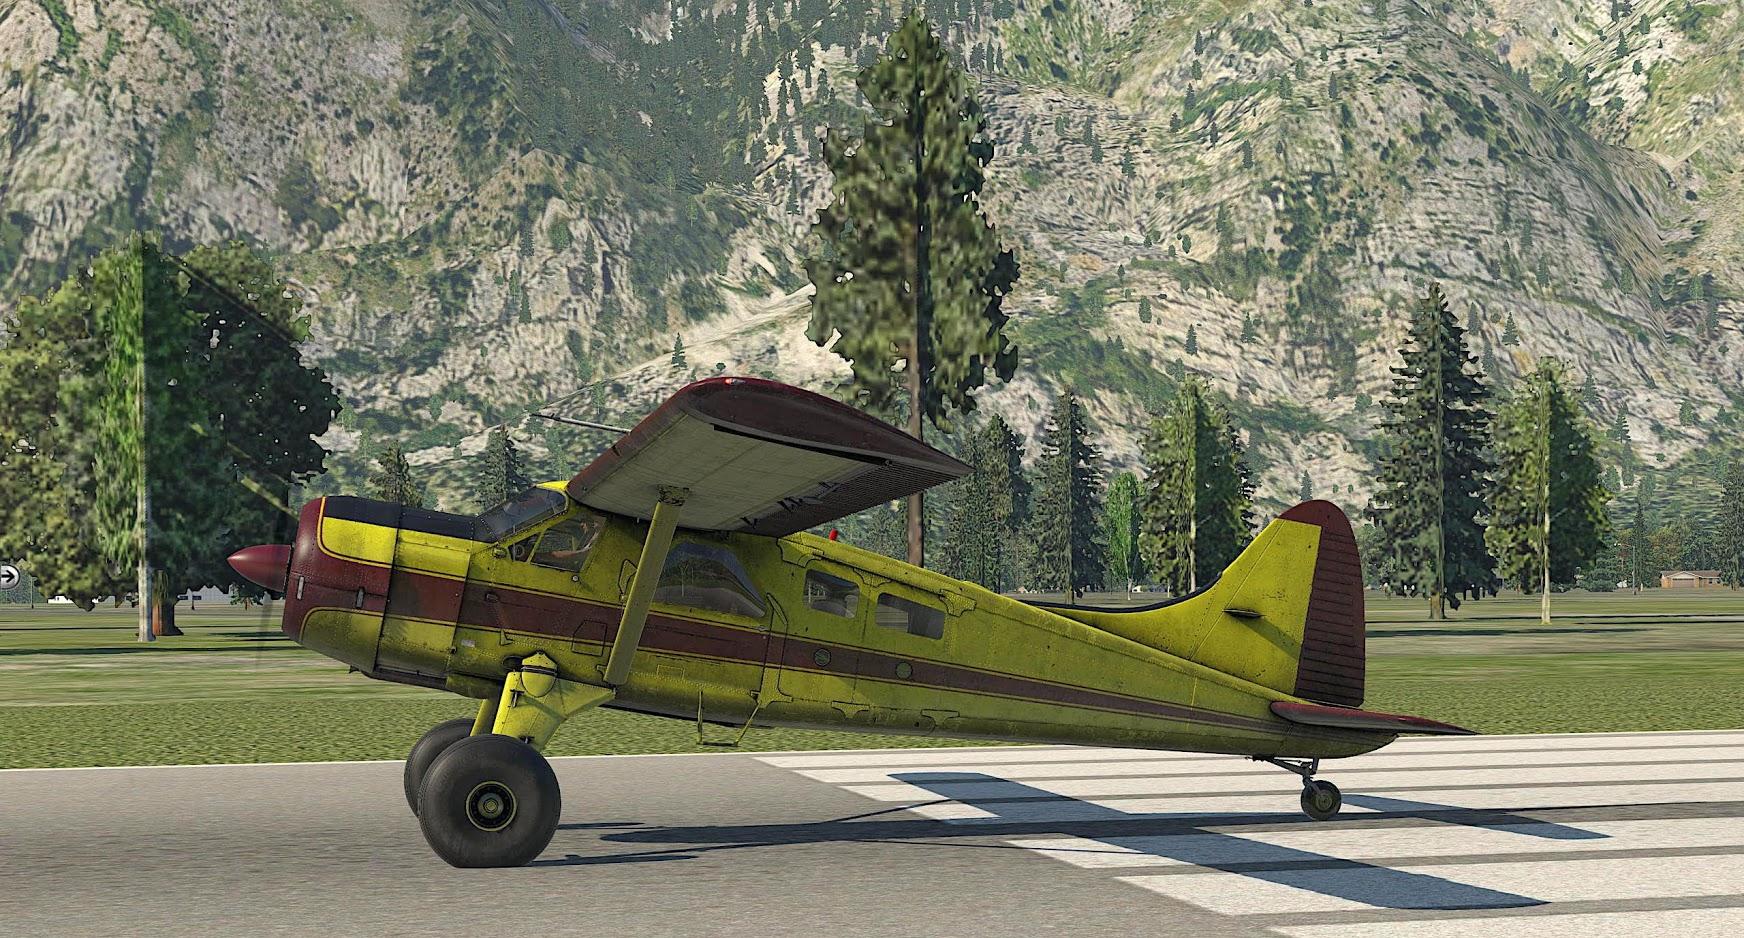 DHC2_Beaver - 2020-11-19 16.10.32